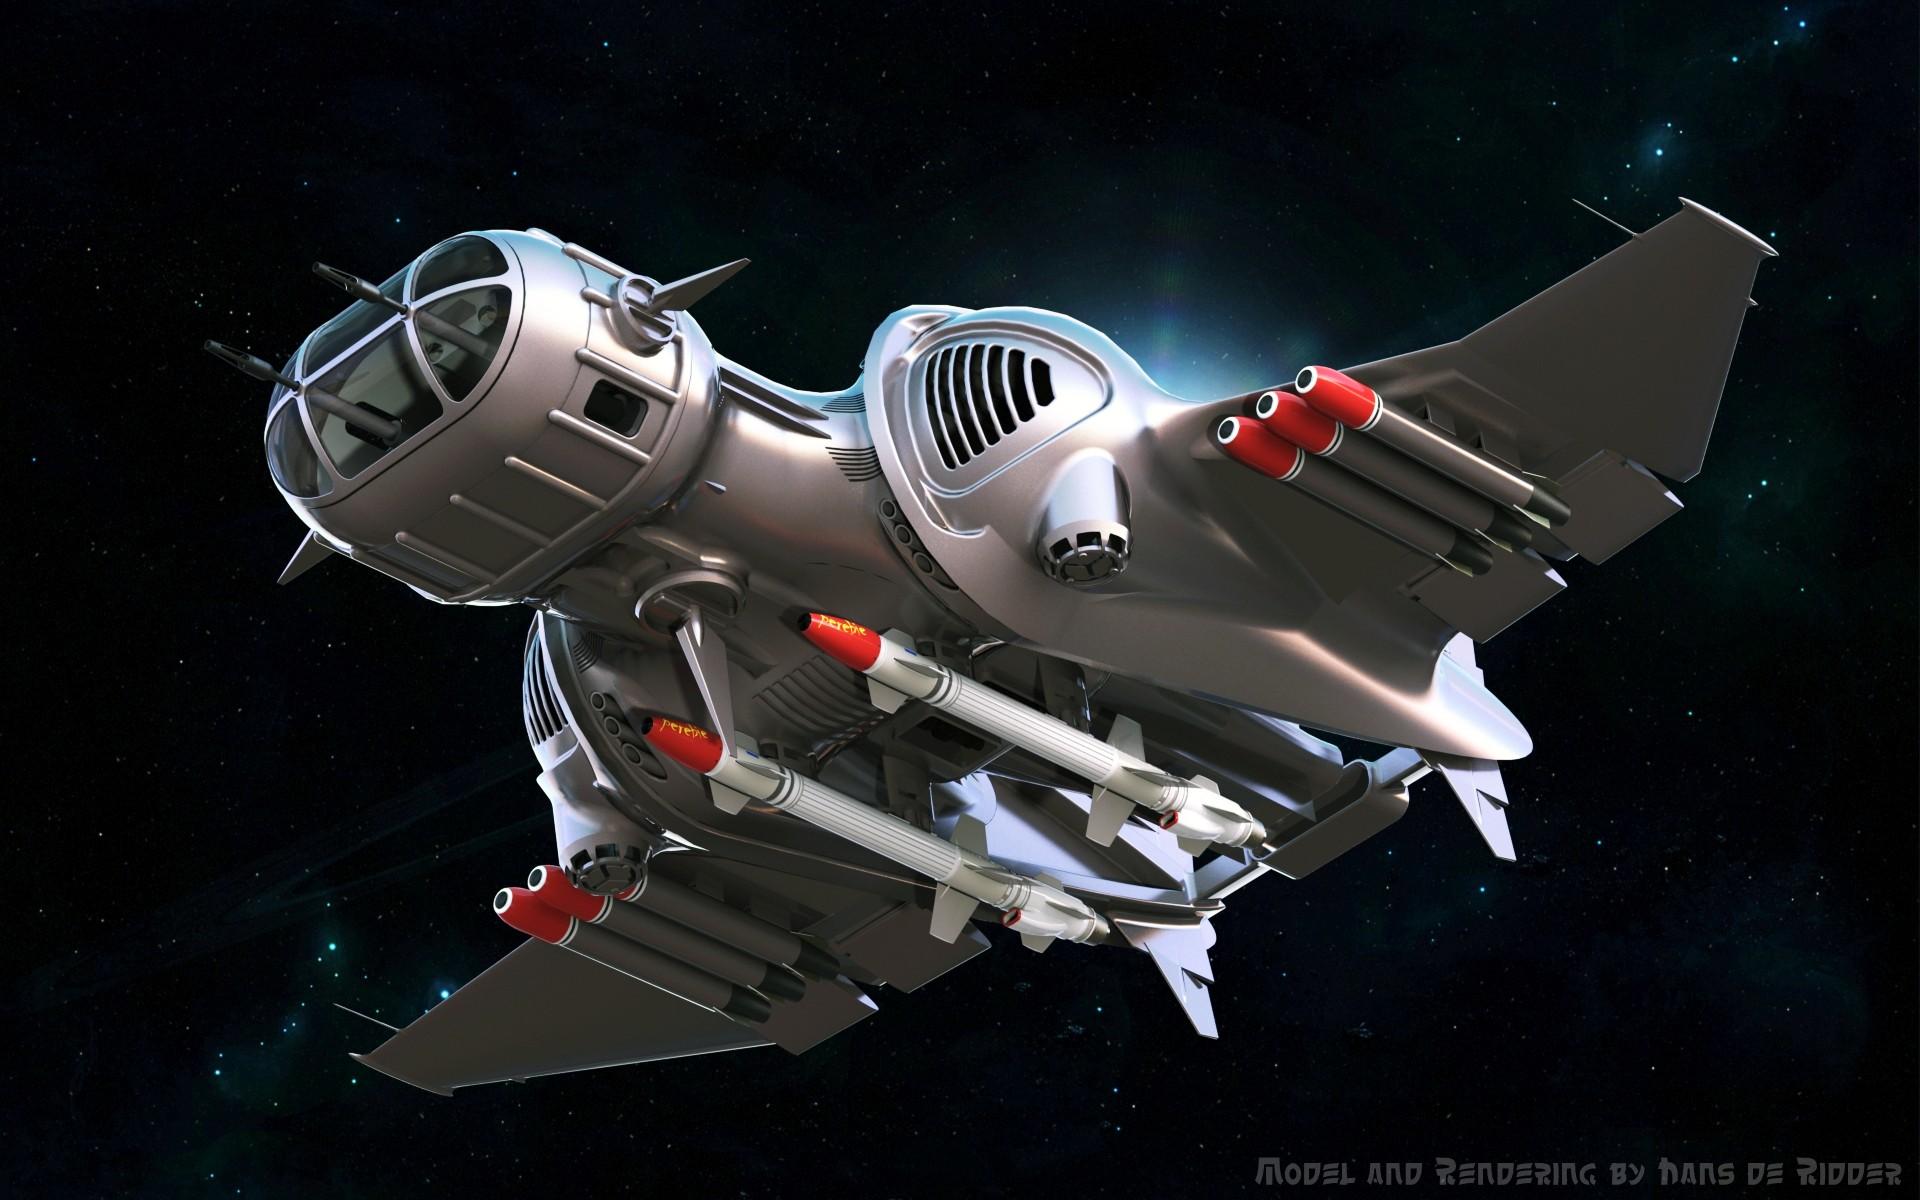 Black Mamba科幻宇宙飞船3D数模图纸 STEP格式